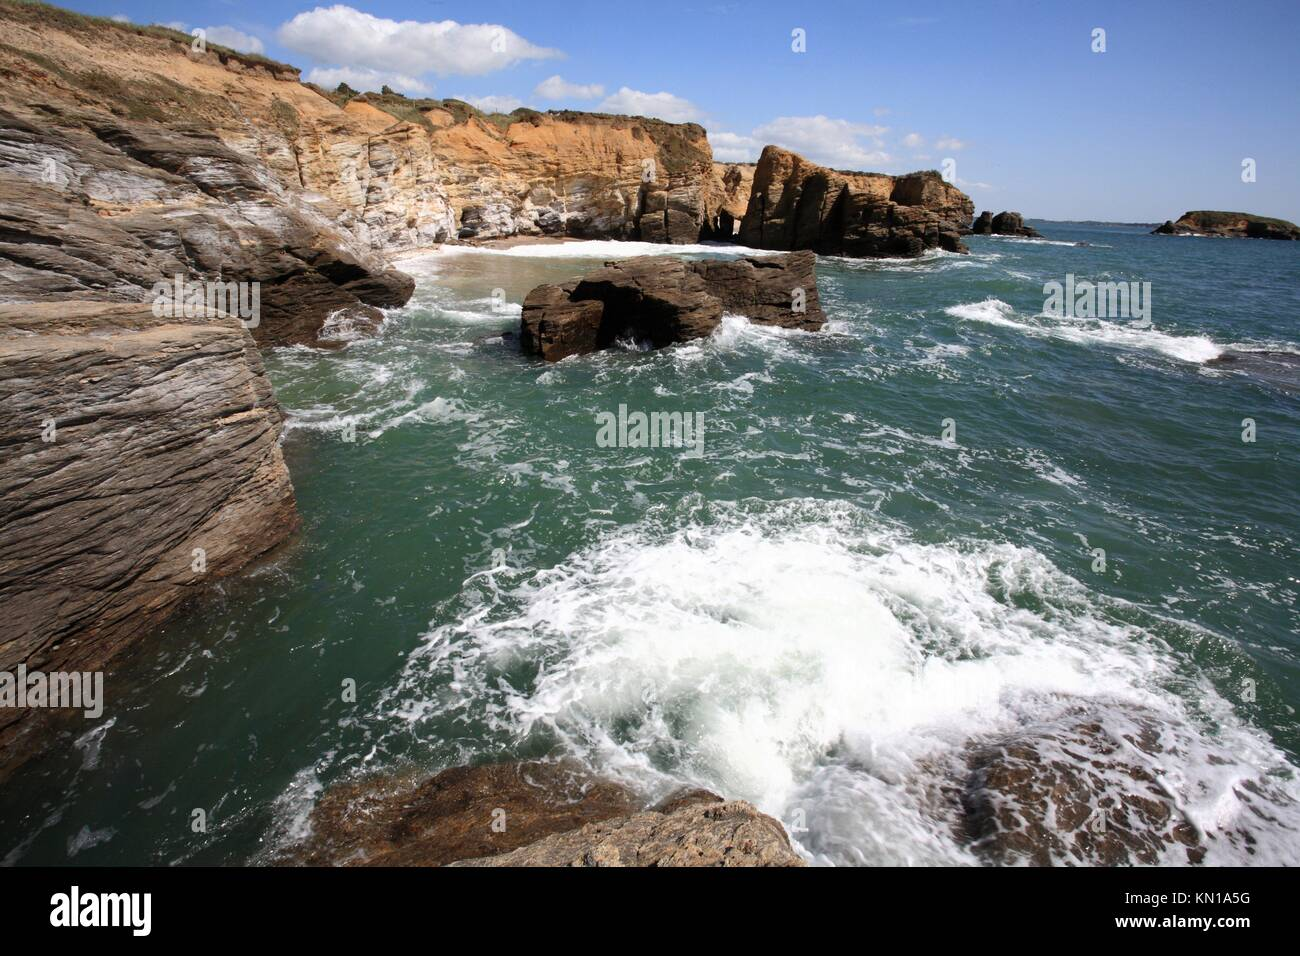 Brittany, Morbihan, Penestin, Pointe du Bile coast, France - Stock Image